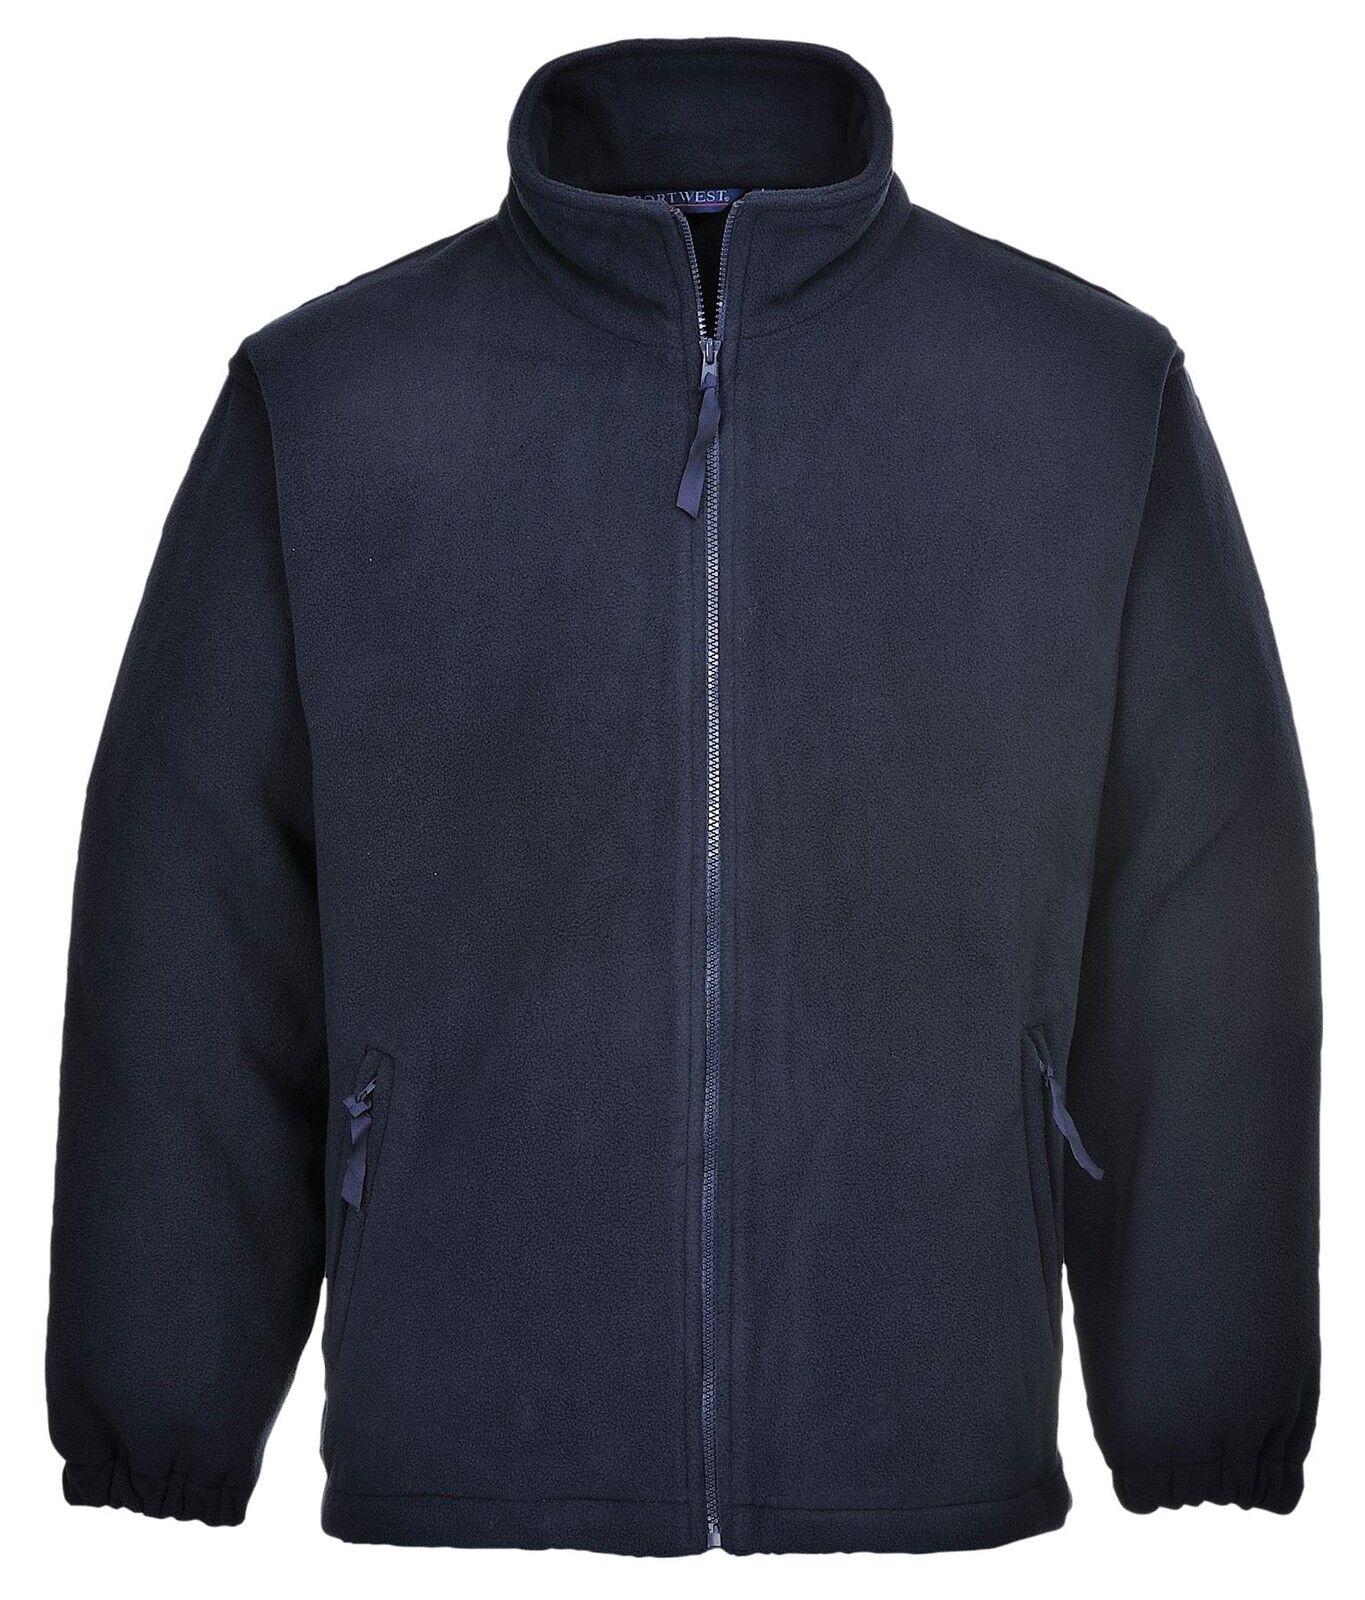 Portwest Aran Chaqueta Chaqueta Chaqueta de Abrigo de lana Workwear Ocio Cremallera acabado anti-píldora F205 533faf